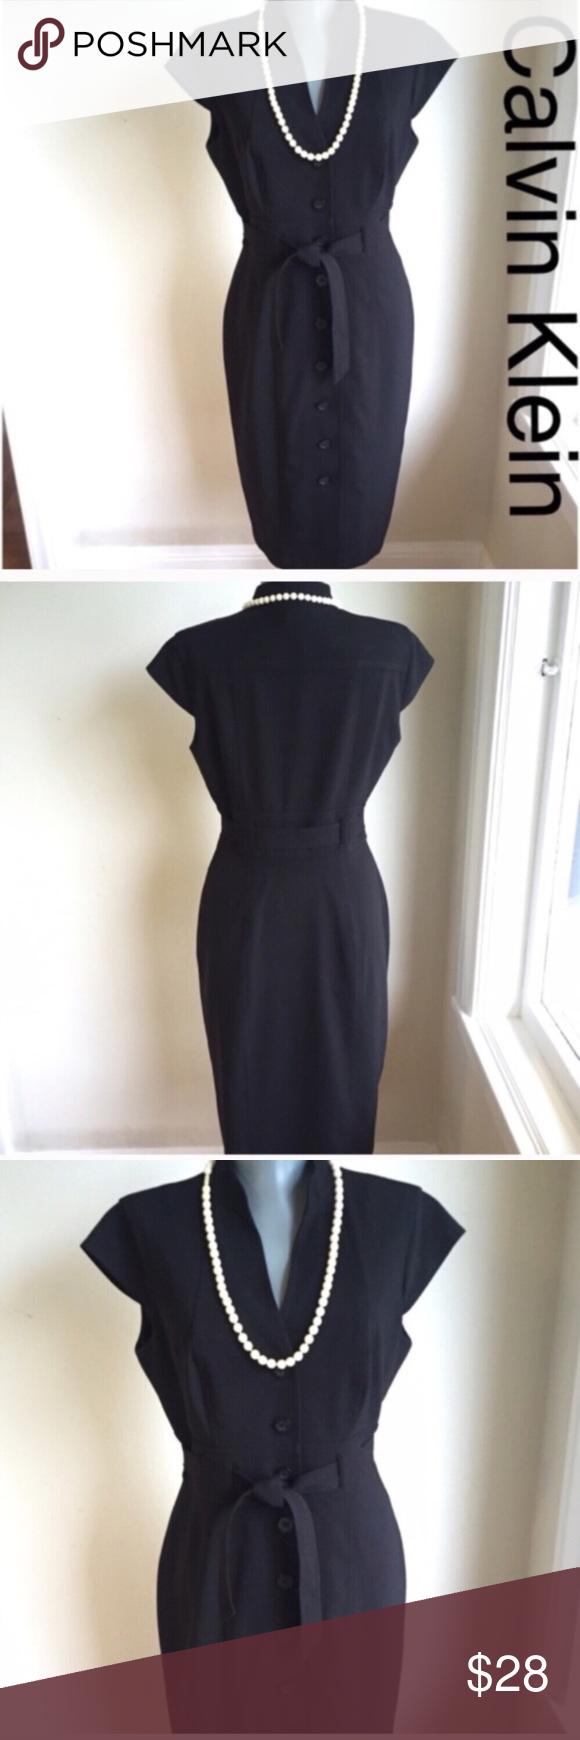 "Calvin Klein Black Dress. Timeless Sophistication. Calvin Klein Black Dress. Timeless Sophistication.  Flat lay measurements. Between under arms 15 1/2"".  Waist 26"". Hips 34"".  Very good condition.  Length 36"".  Gorgeous. Calvin Klein Dresses"